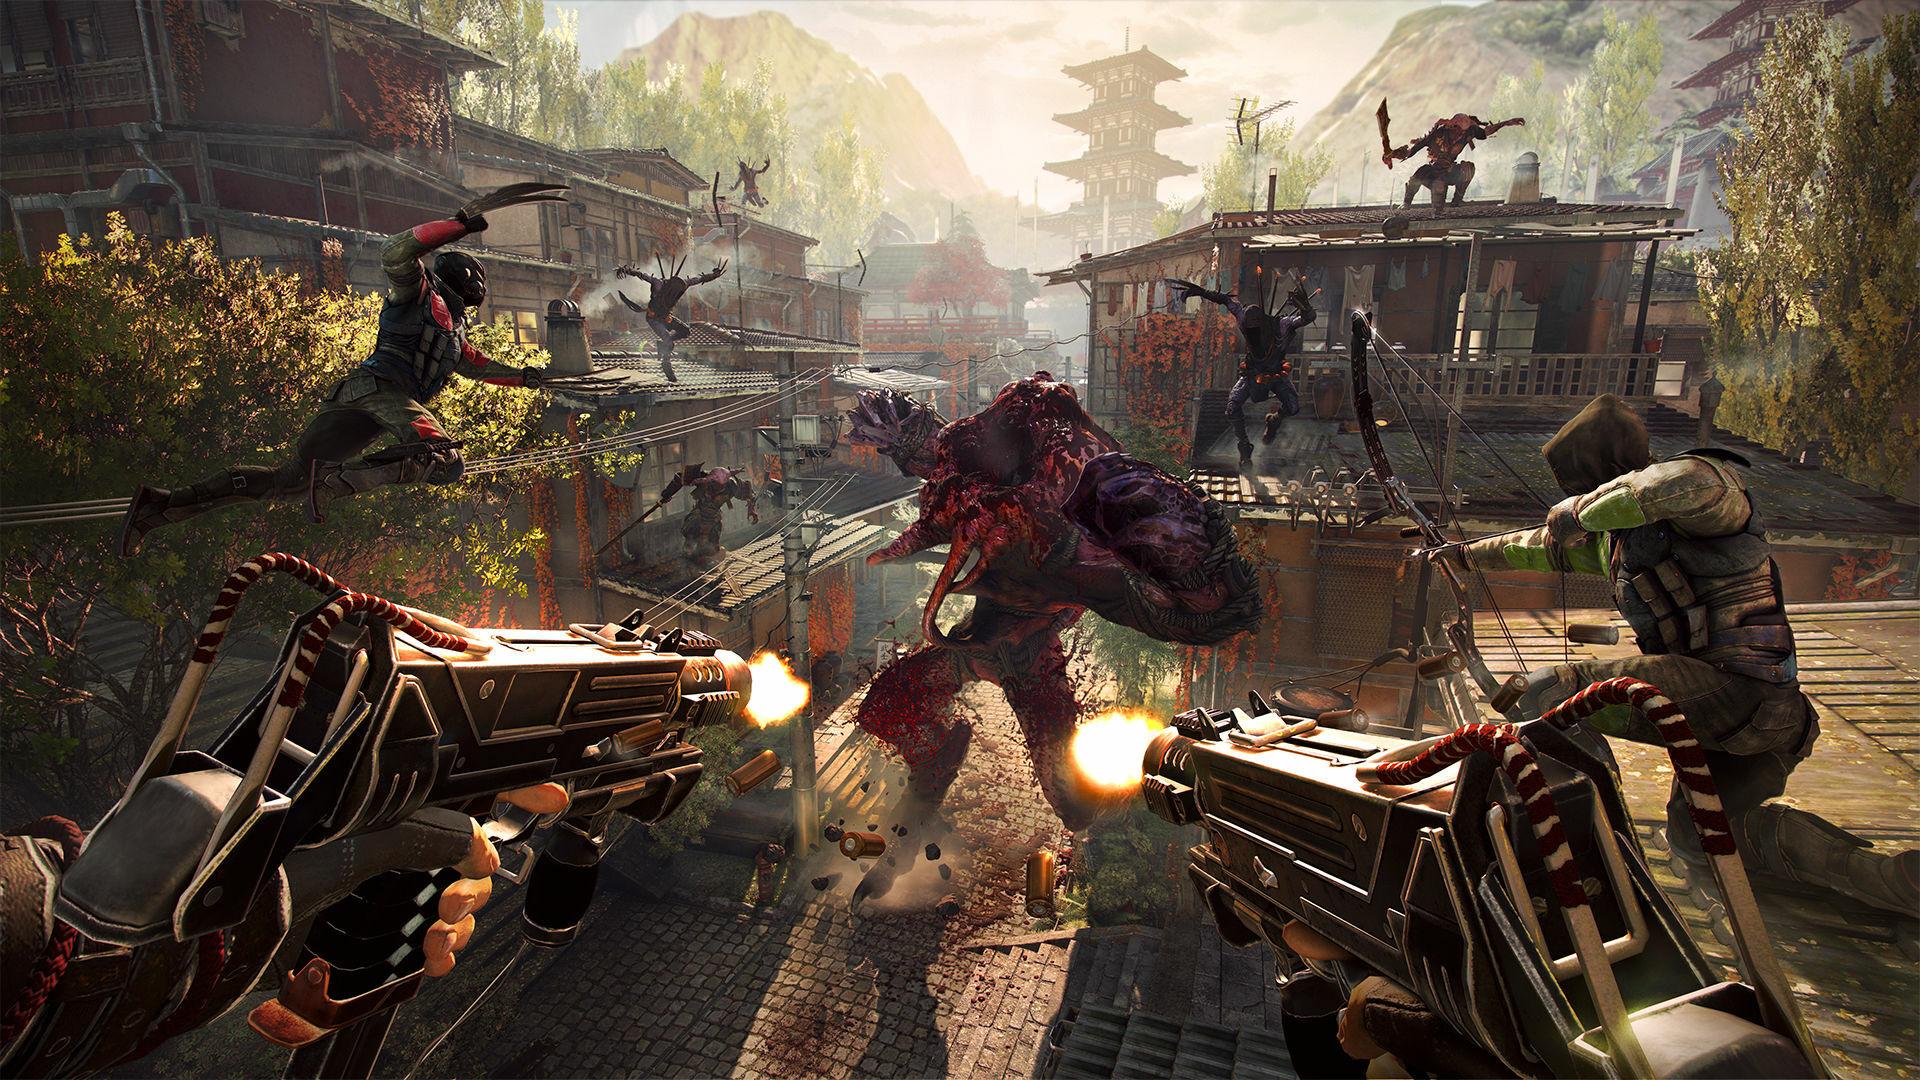 shadow-warrior-pc-screenshot-1